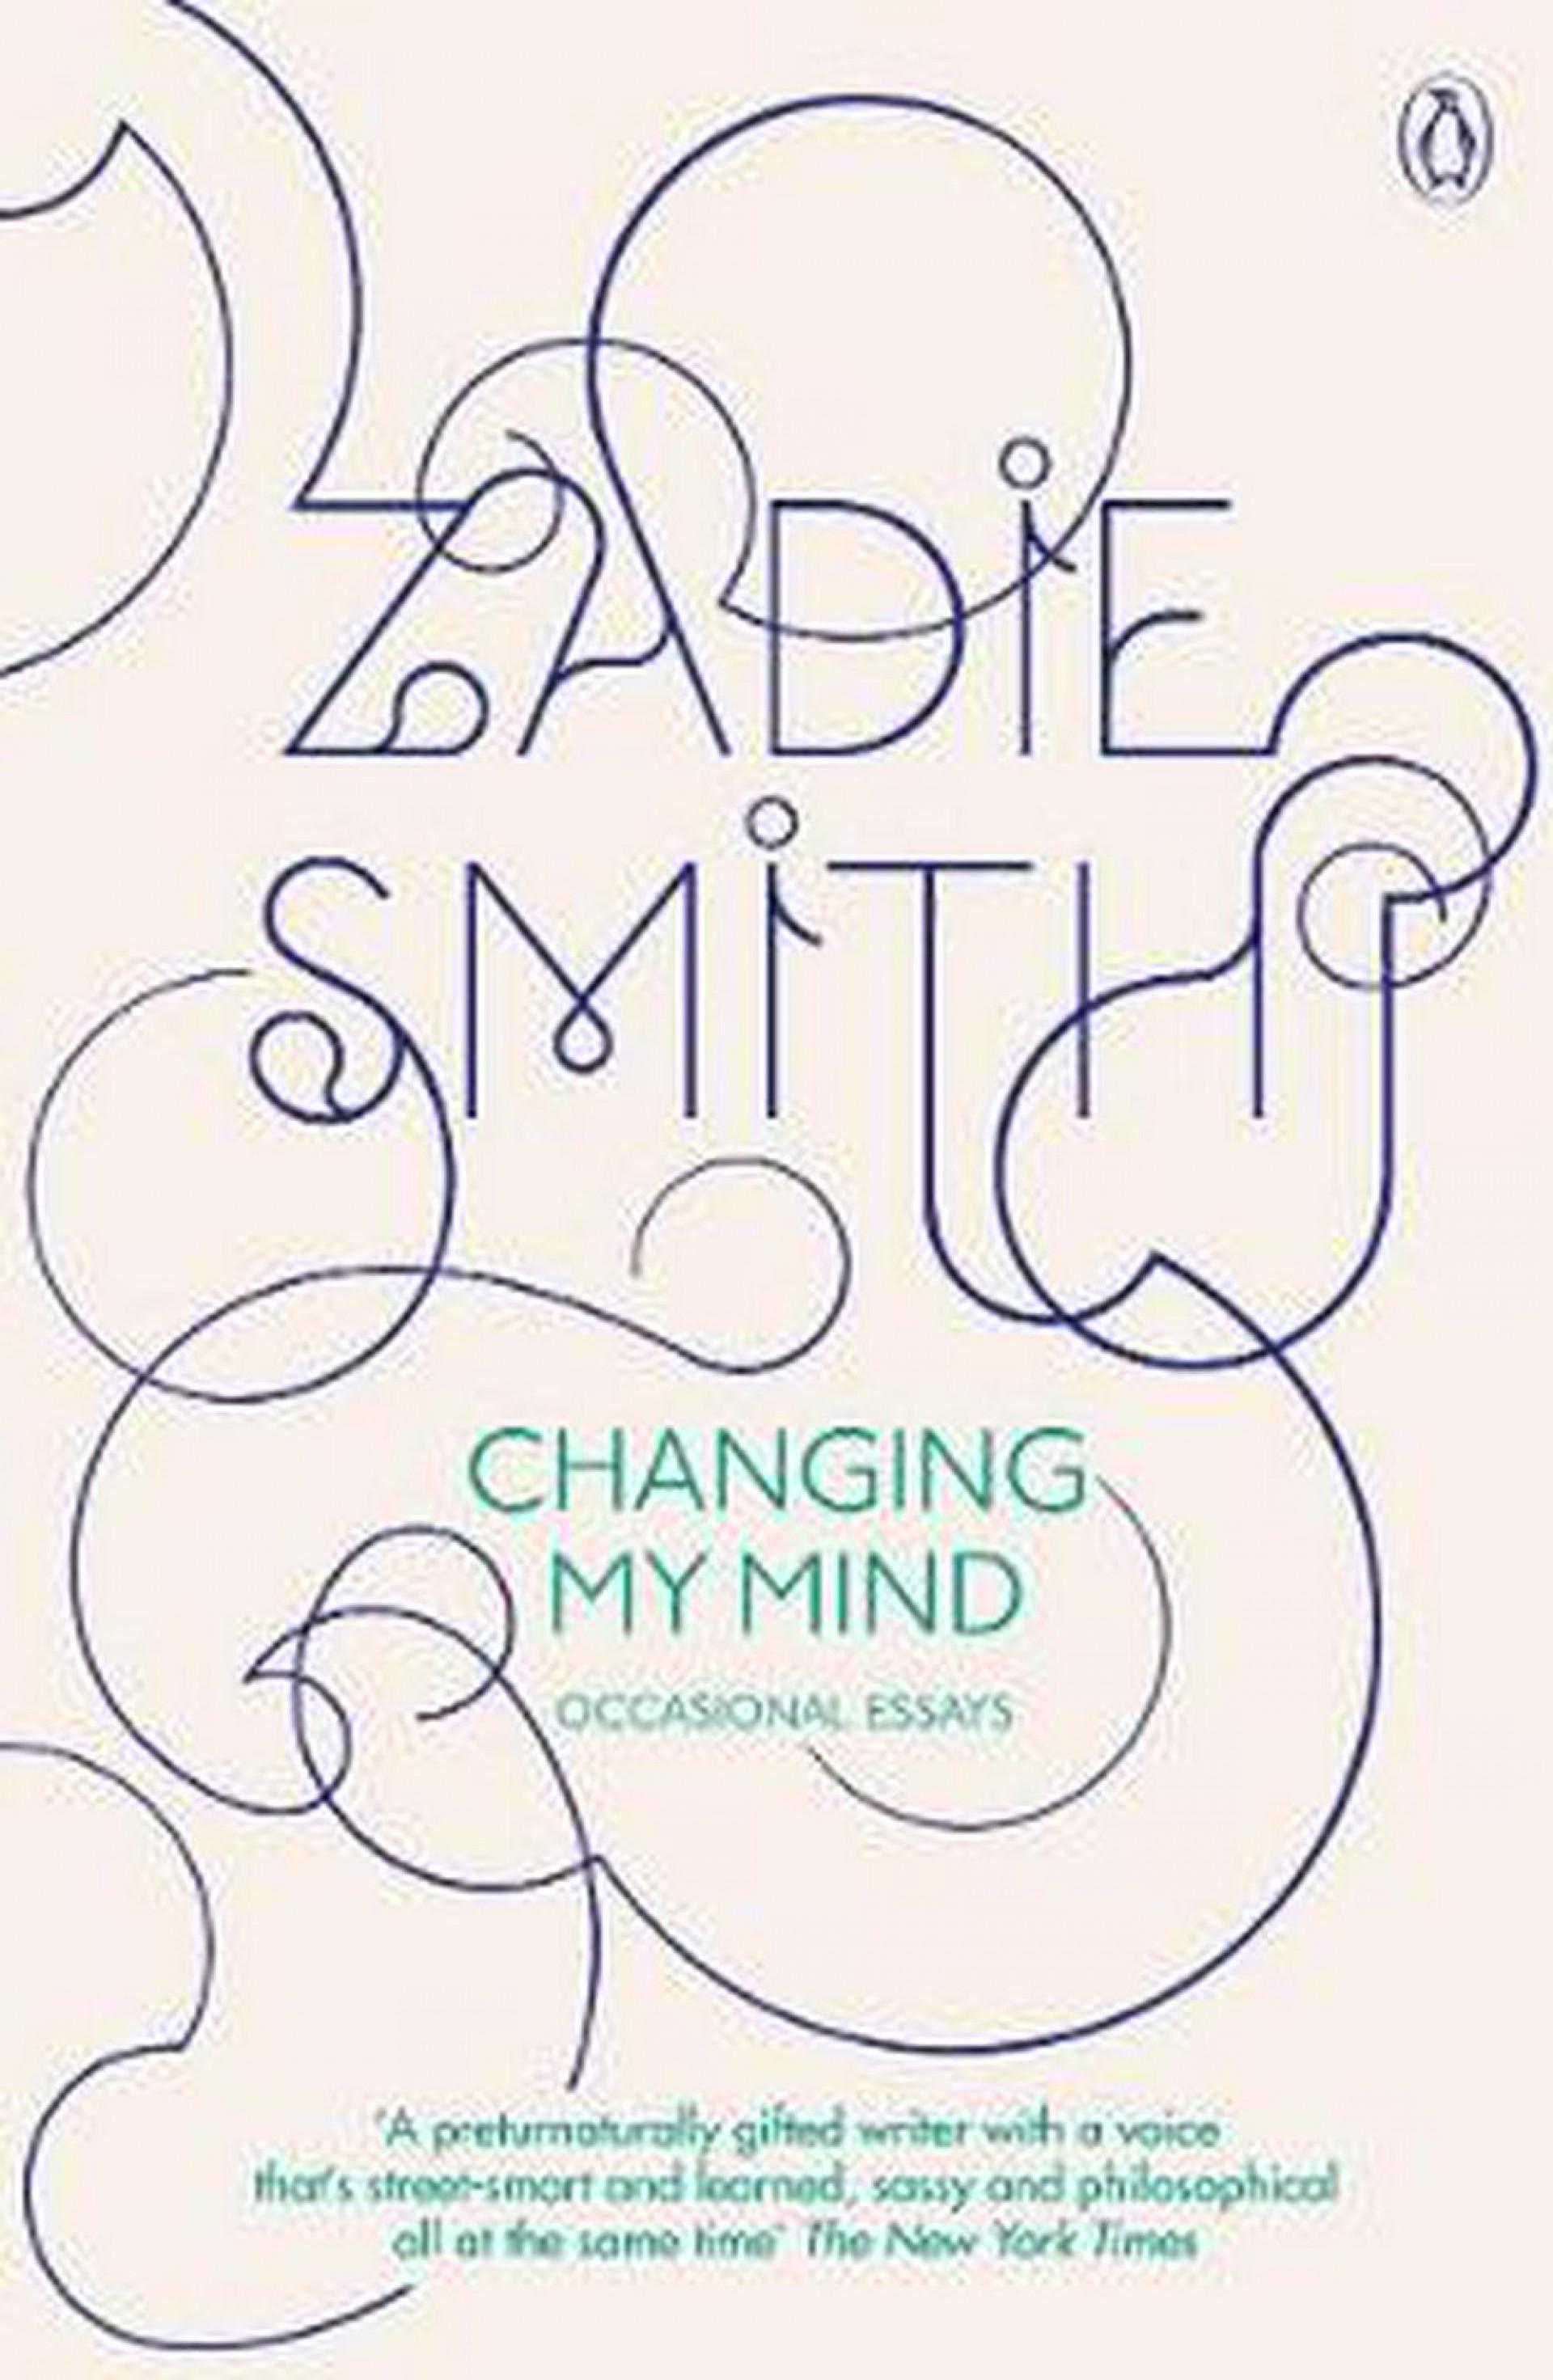 003 Essay Example Changing My Mind Occasional Essays Striking Pdf By Zadie Smith 1920